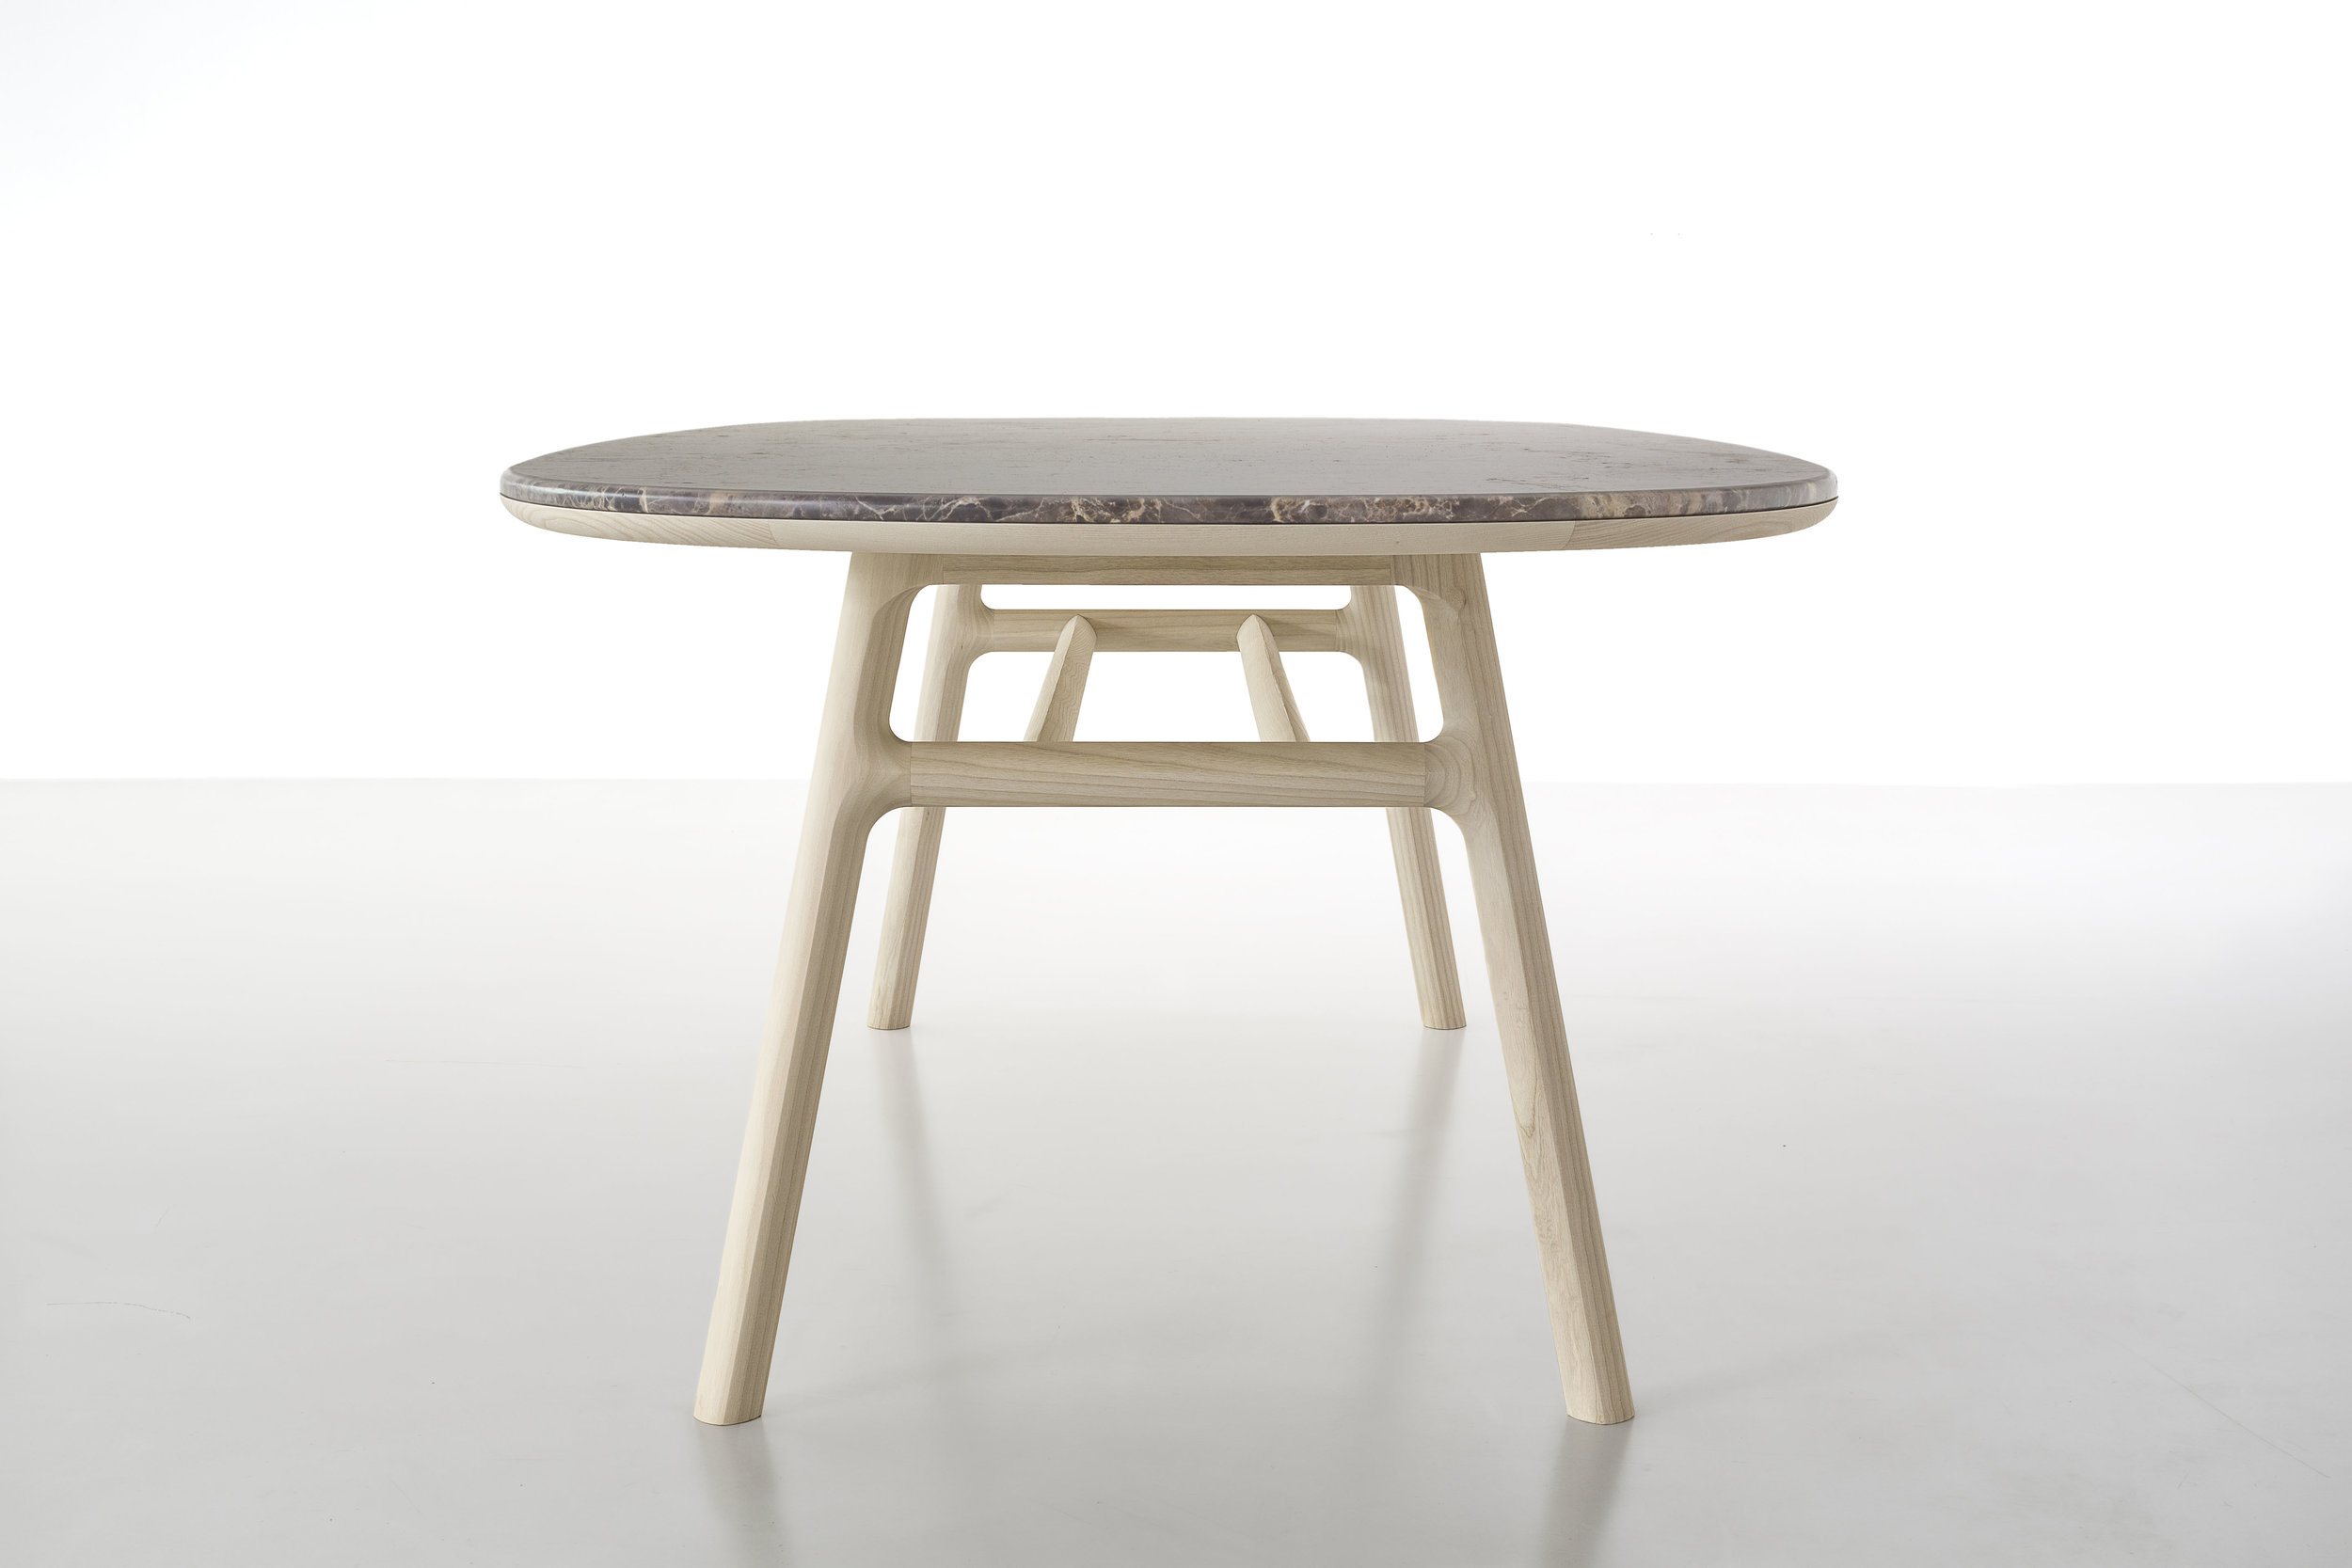 medeo-table_furniture-design_coordination-berlin_03.jpg